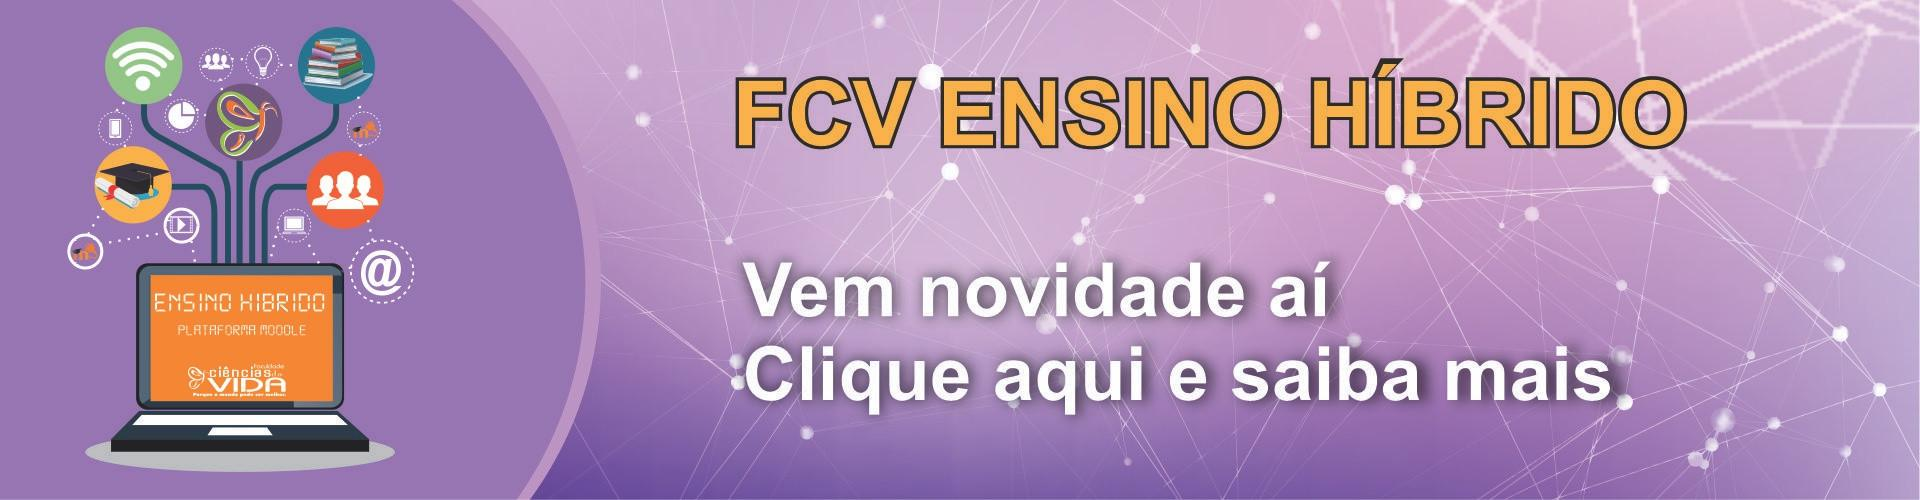 FCV ENSINO HÍBRIDO